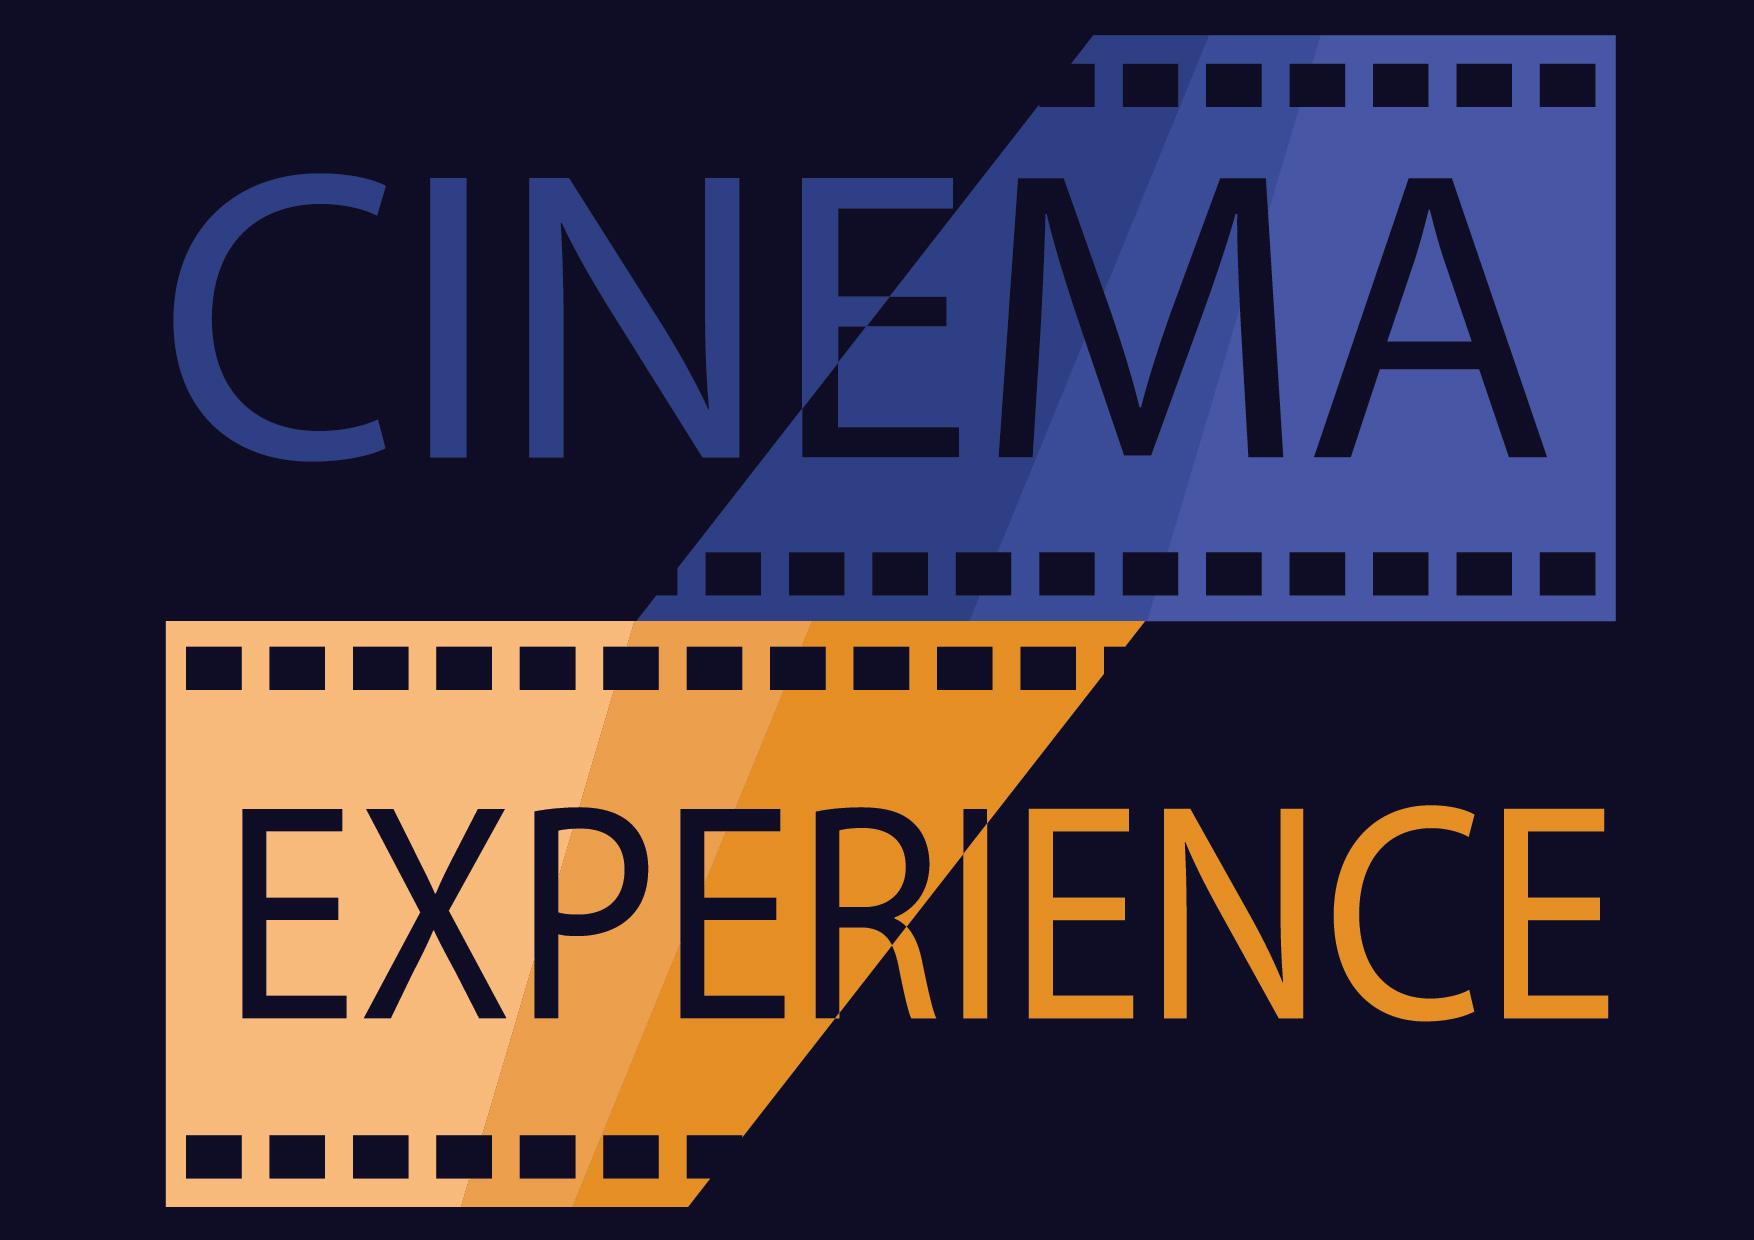 Cinéma expérience